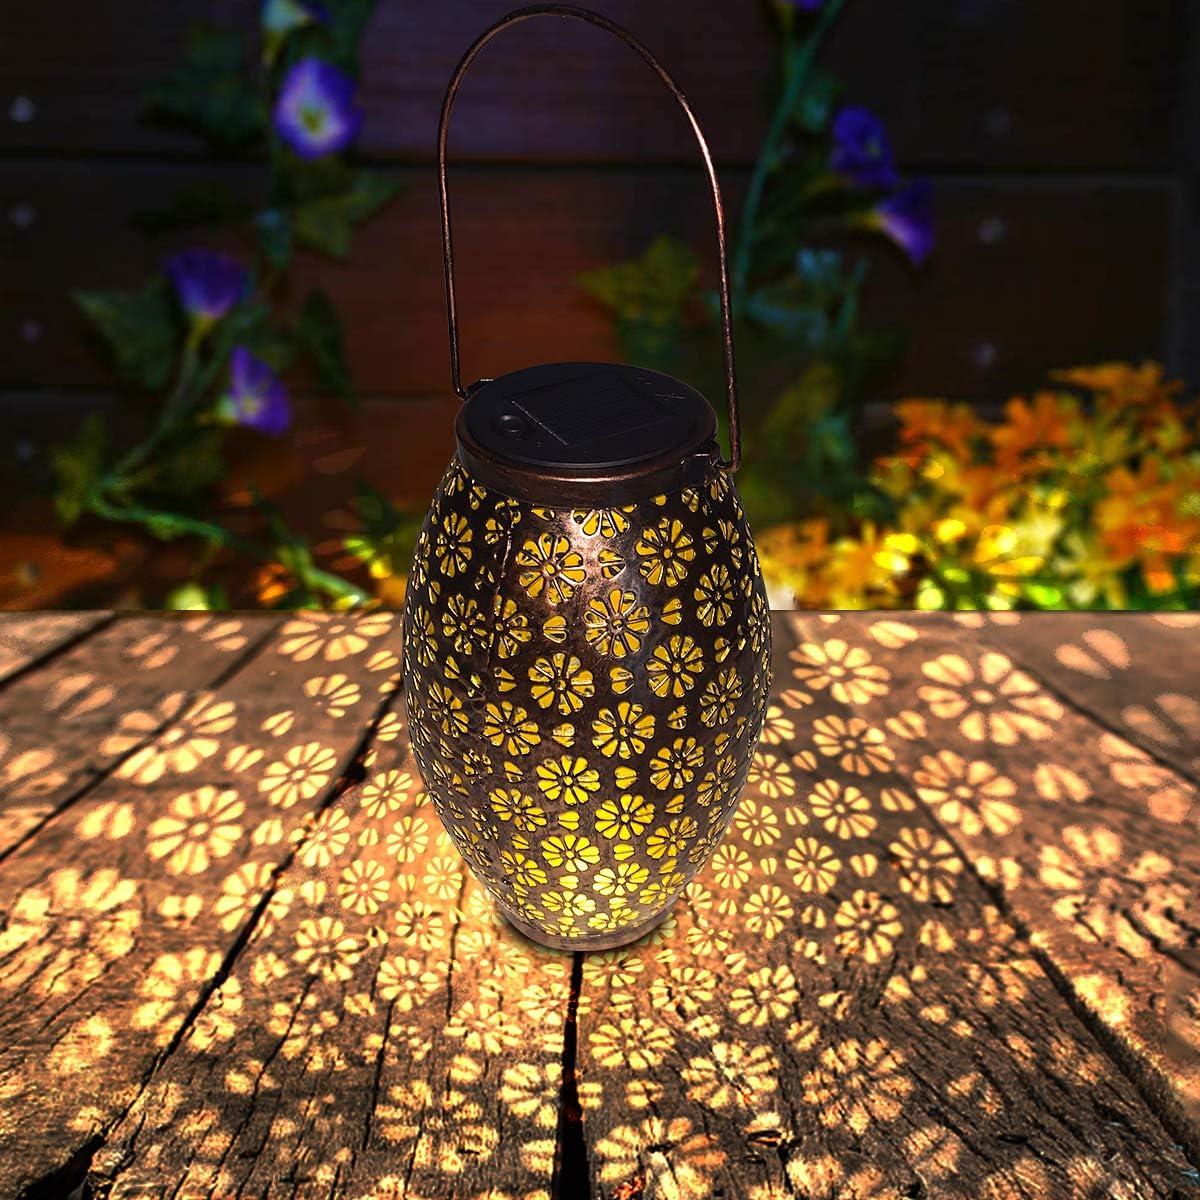 Linterna Solar Exterior, FOCHEA Farol Solar Exterior Impermeable IP65 con Asa para Jardin, Terraza, Patio, Césped: Amazon.es: Iluminación